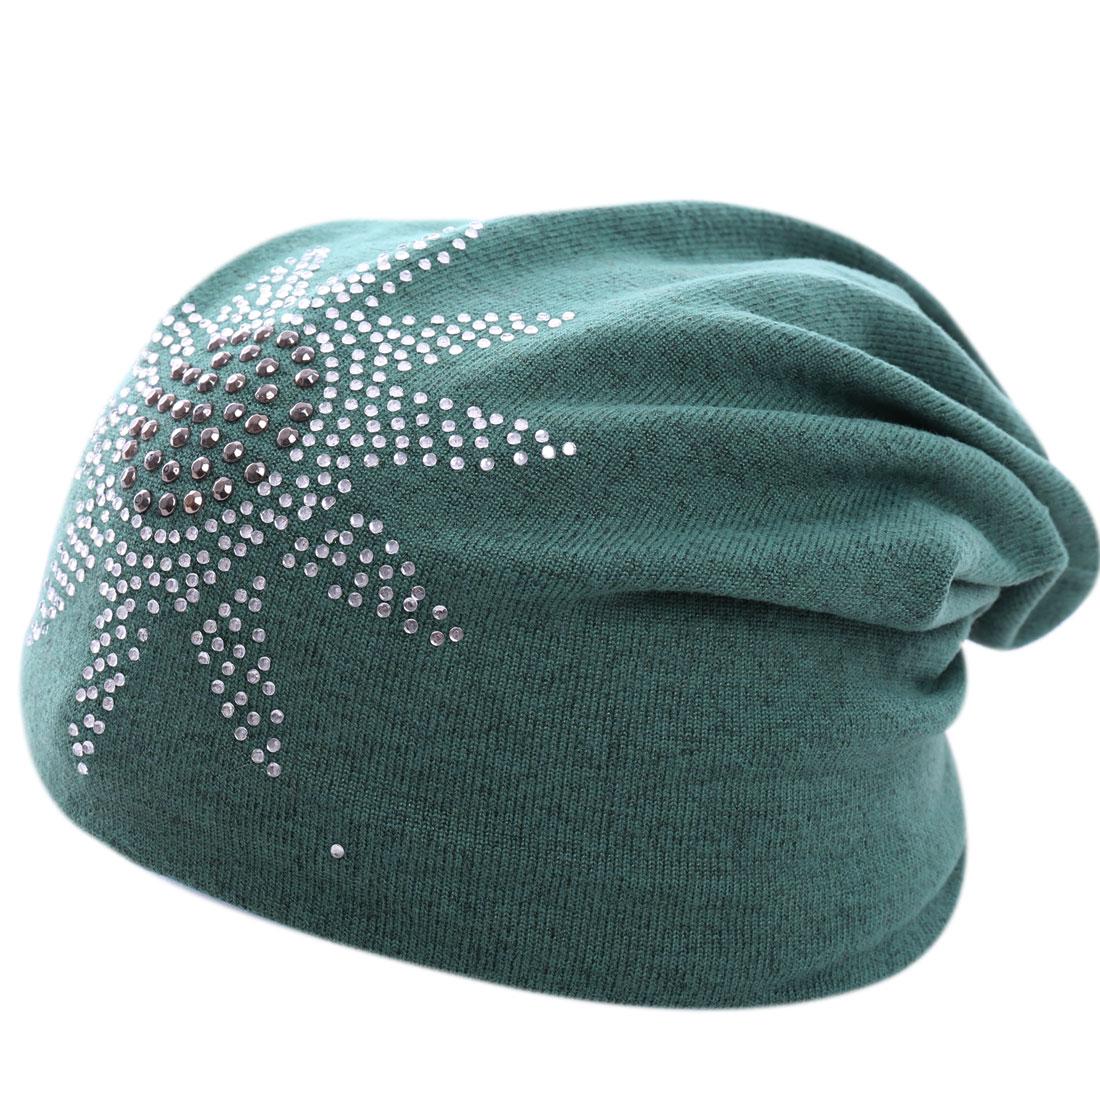 Men Women Crochet Knitting Rhinestone Decor Green Beanie Cap